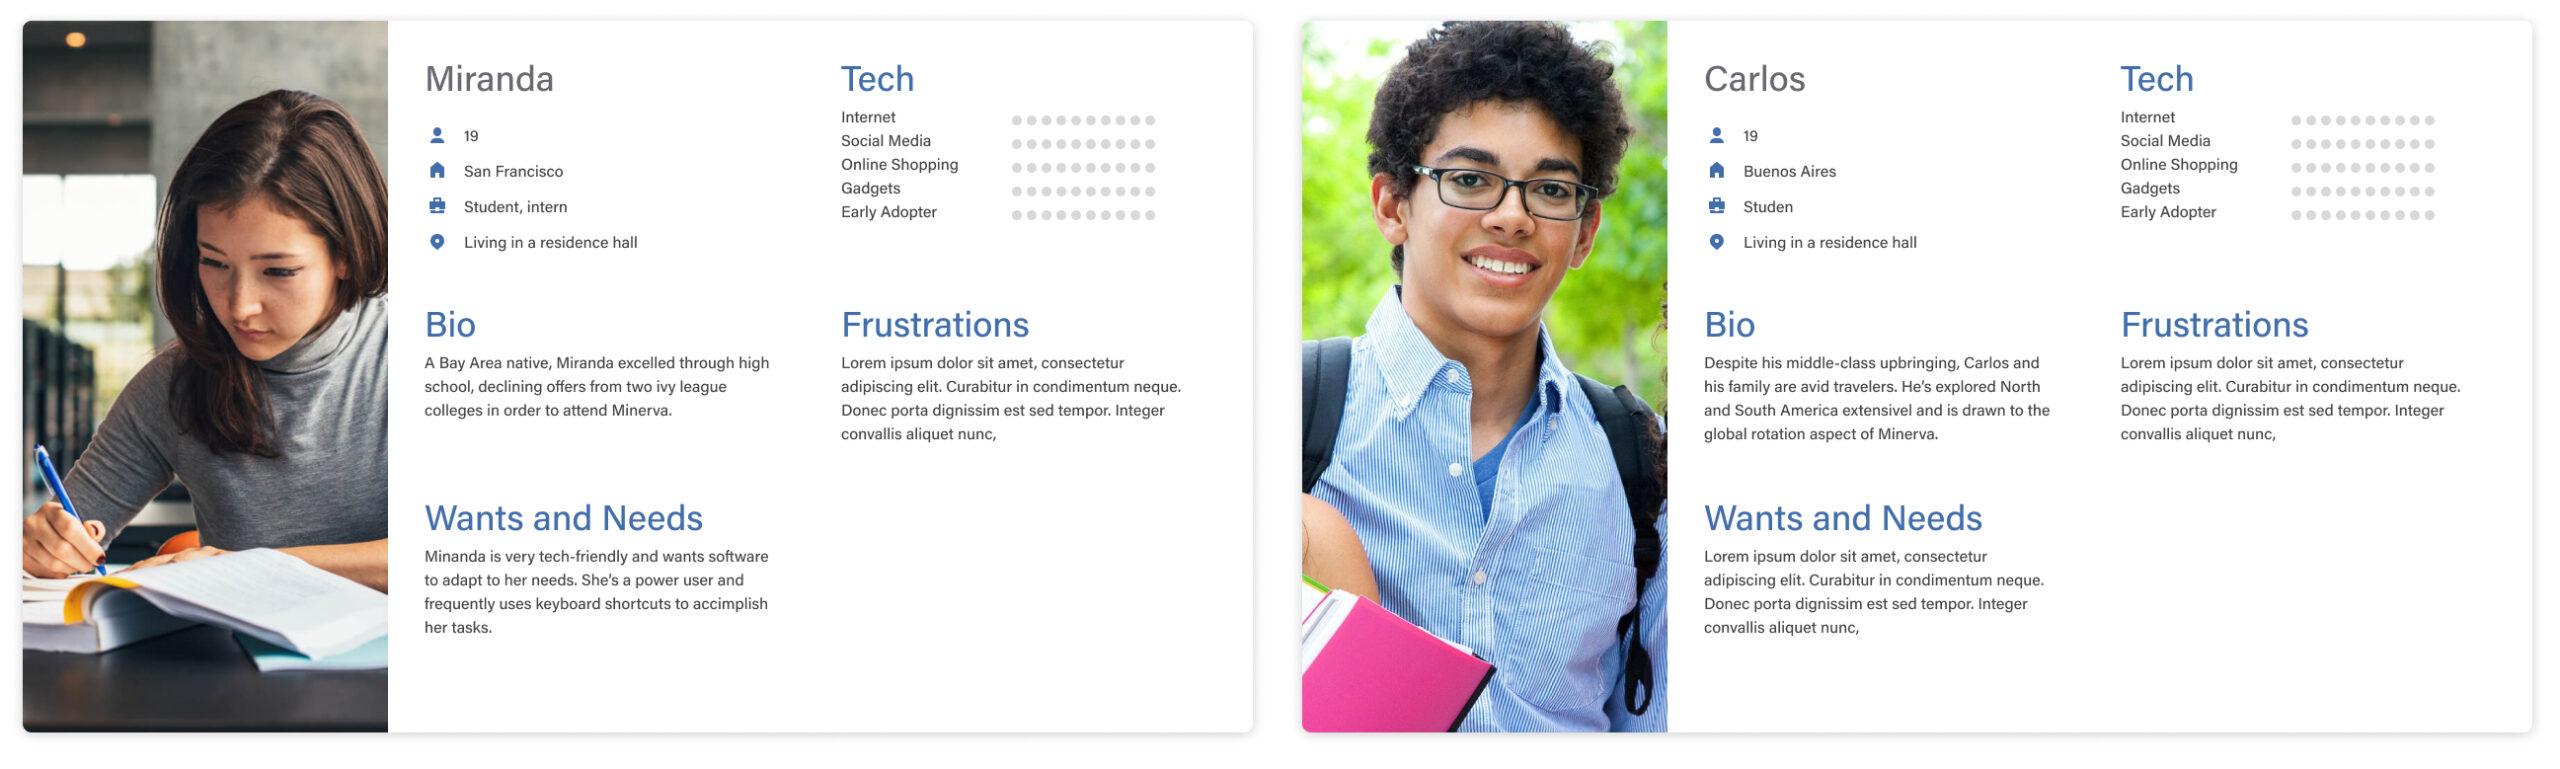 Personas-Students